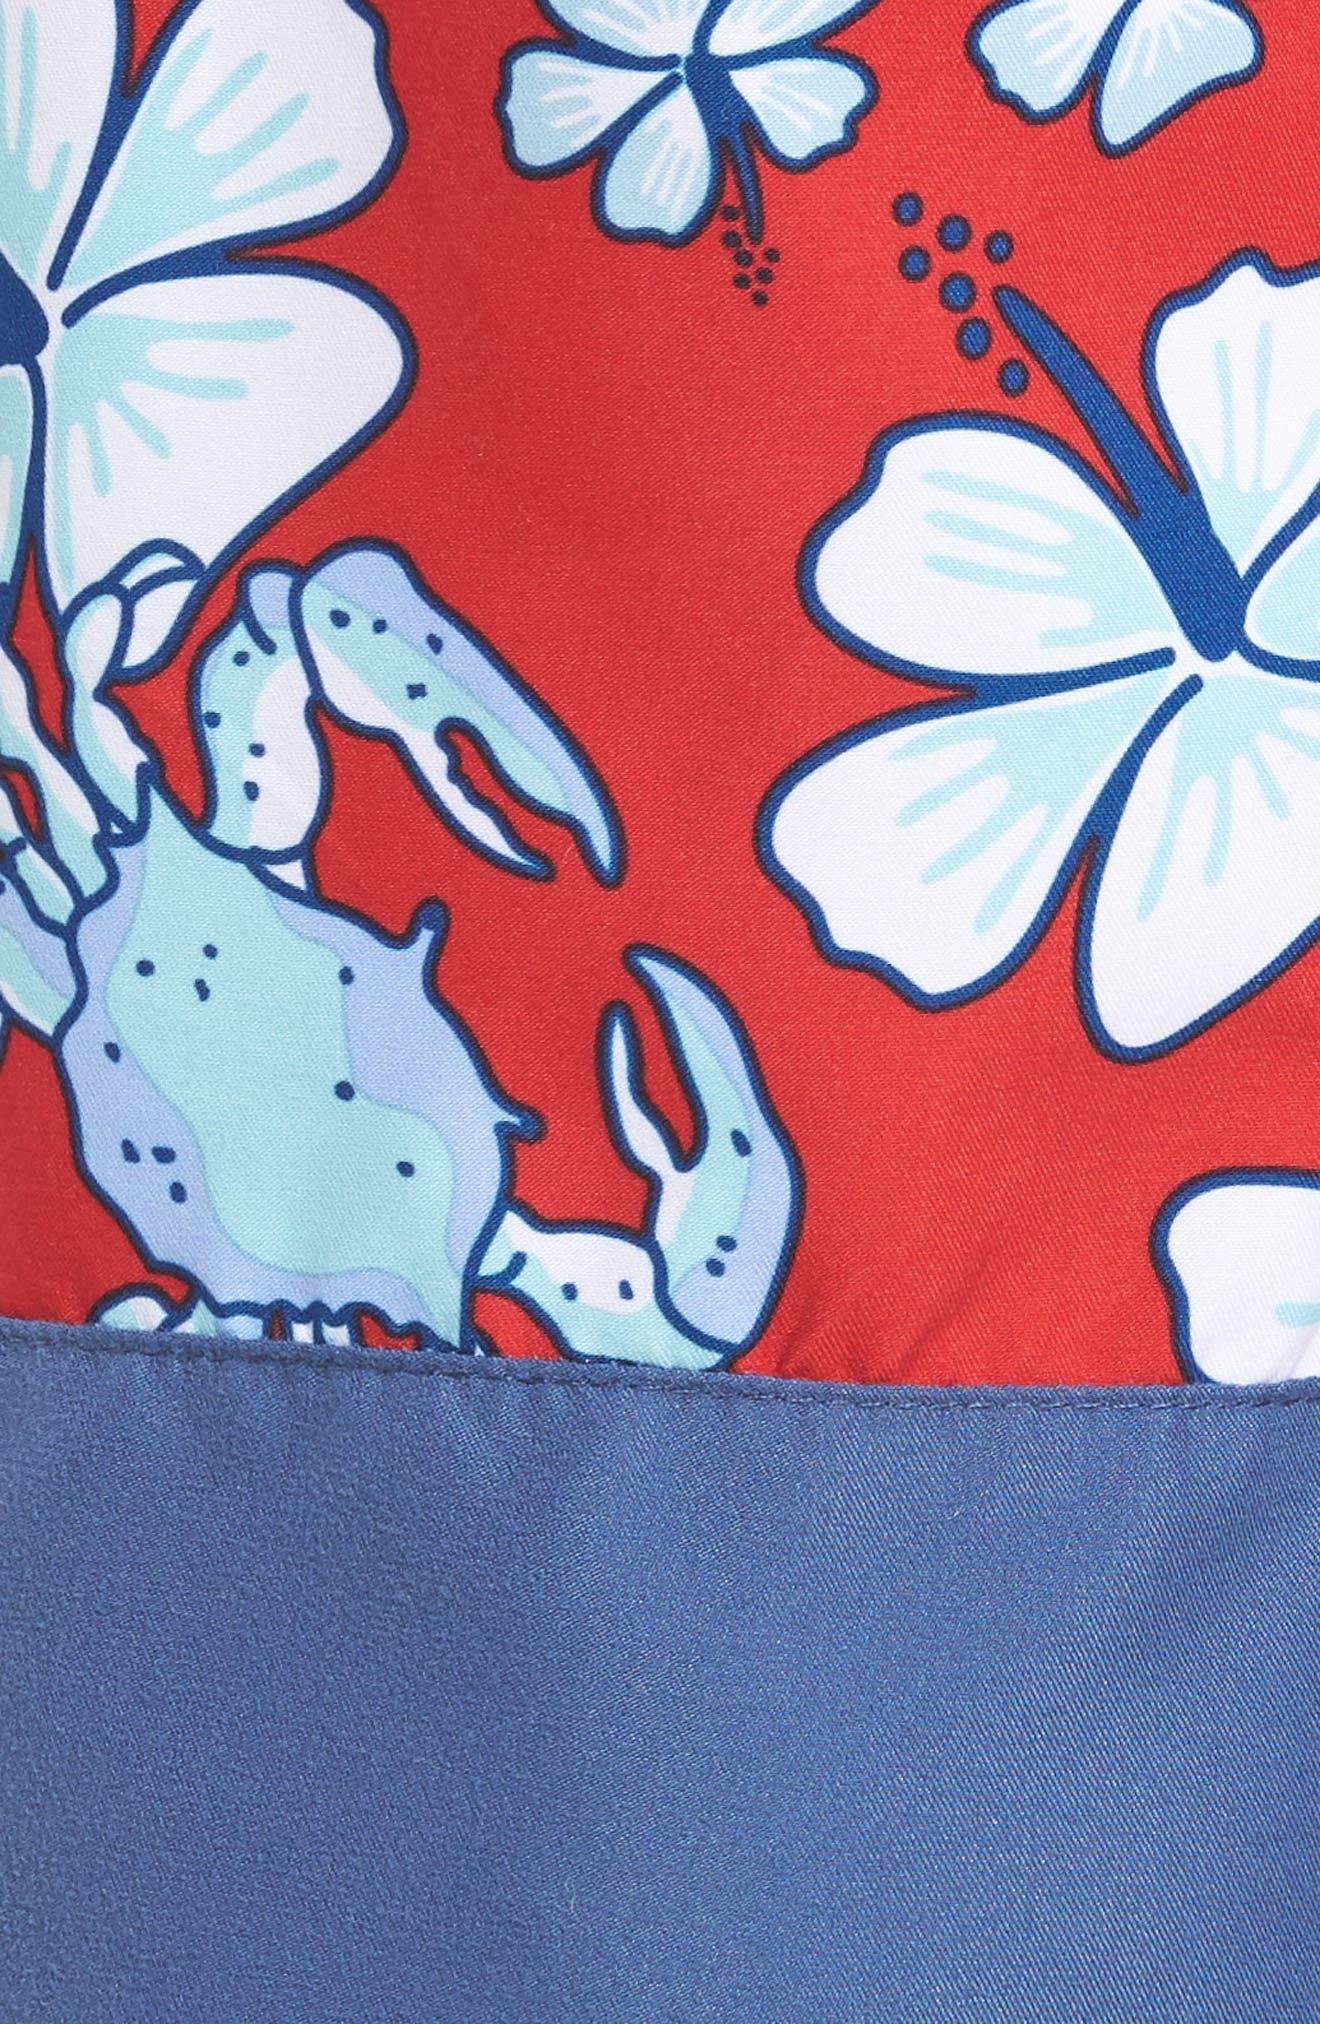 Chappy Crab Piece Swim Trunks,                             Alternate thumbnail 5, color,                             DEEP BAY